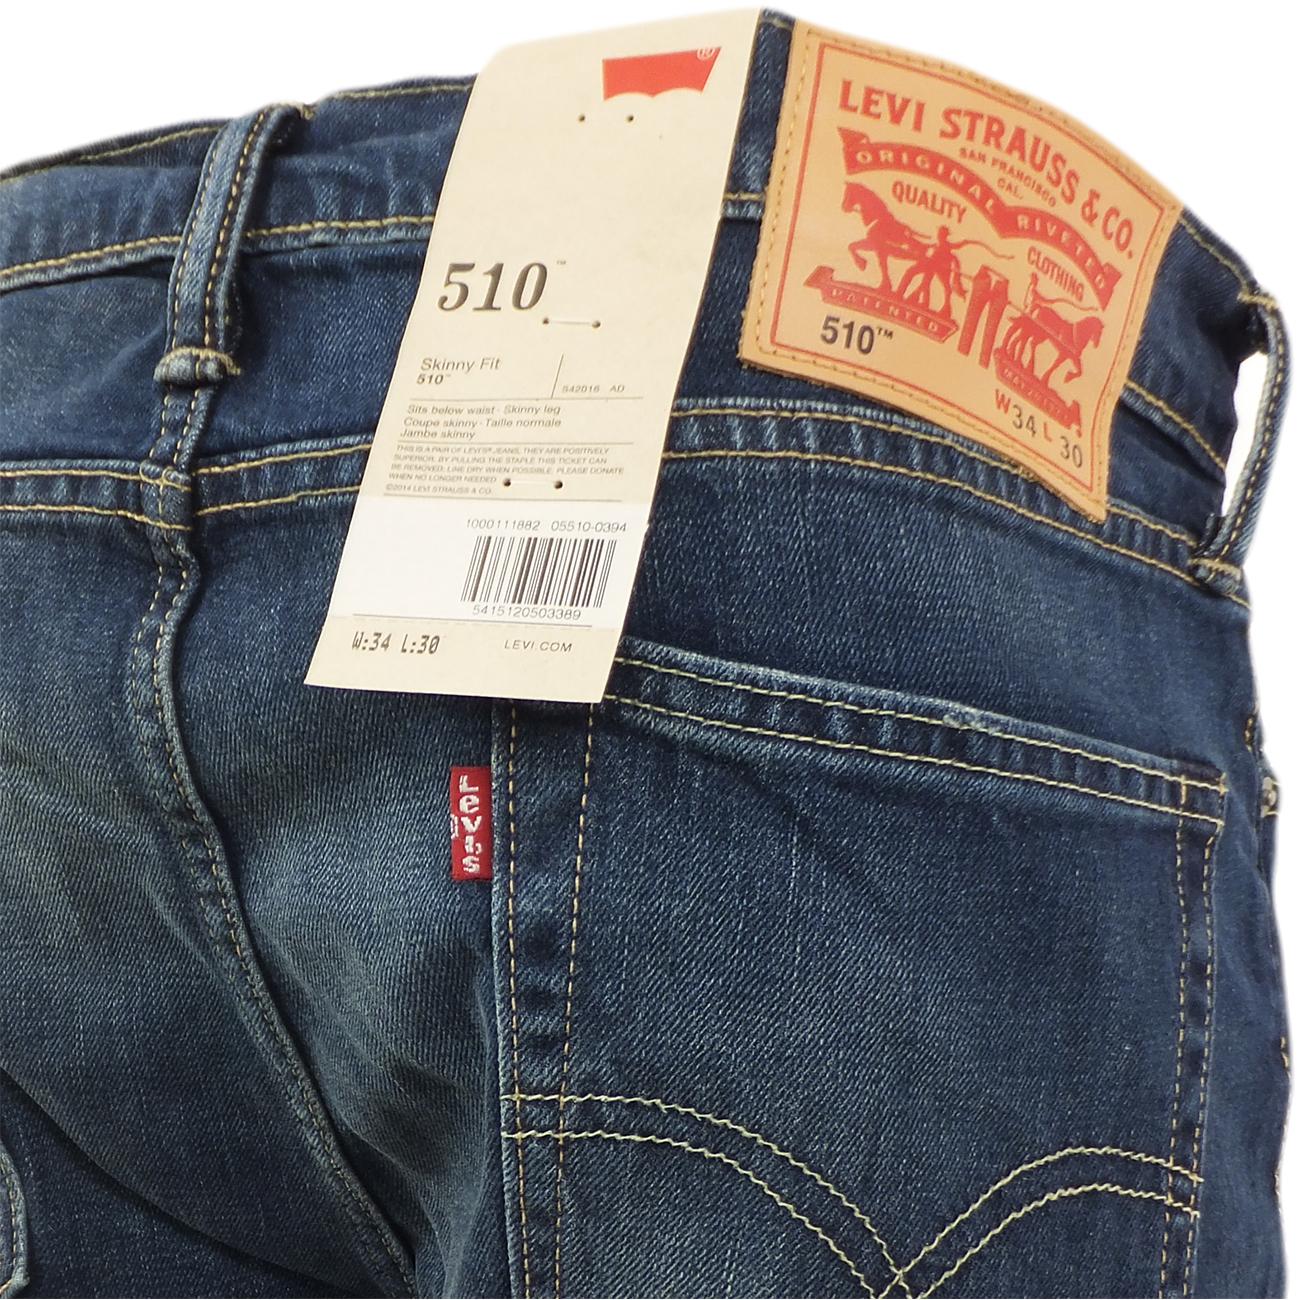 levi 510 skinny fit jean slim skinny leg canyon blue